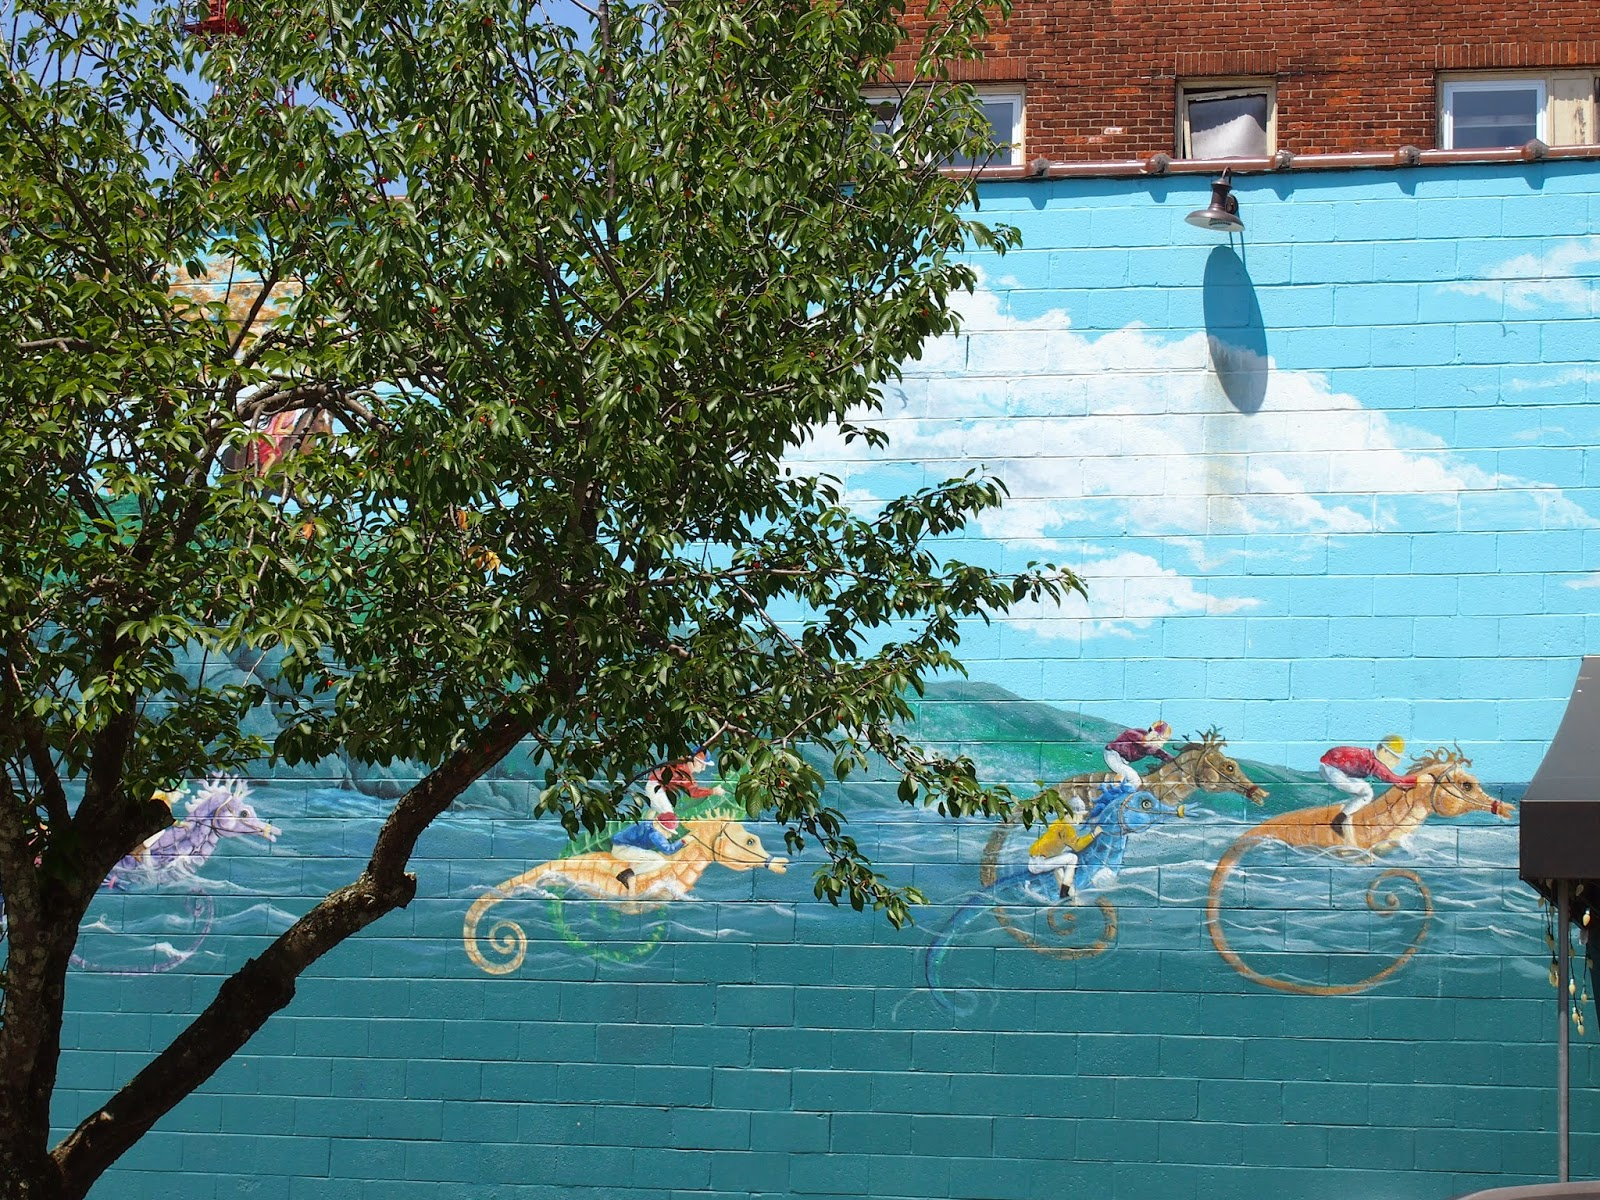 racing sea horses street art in New London, Connecticut